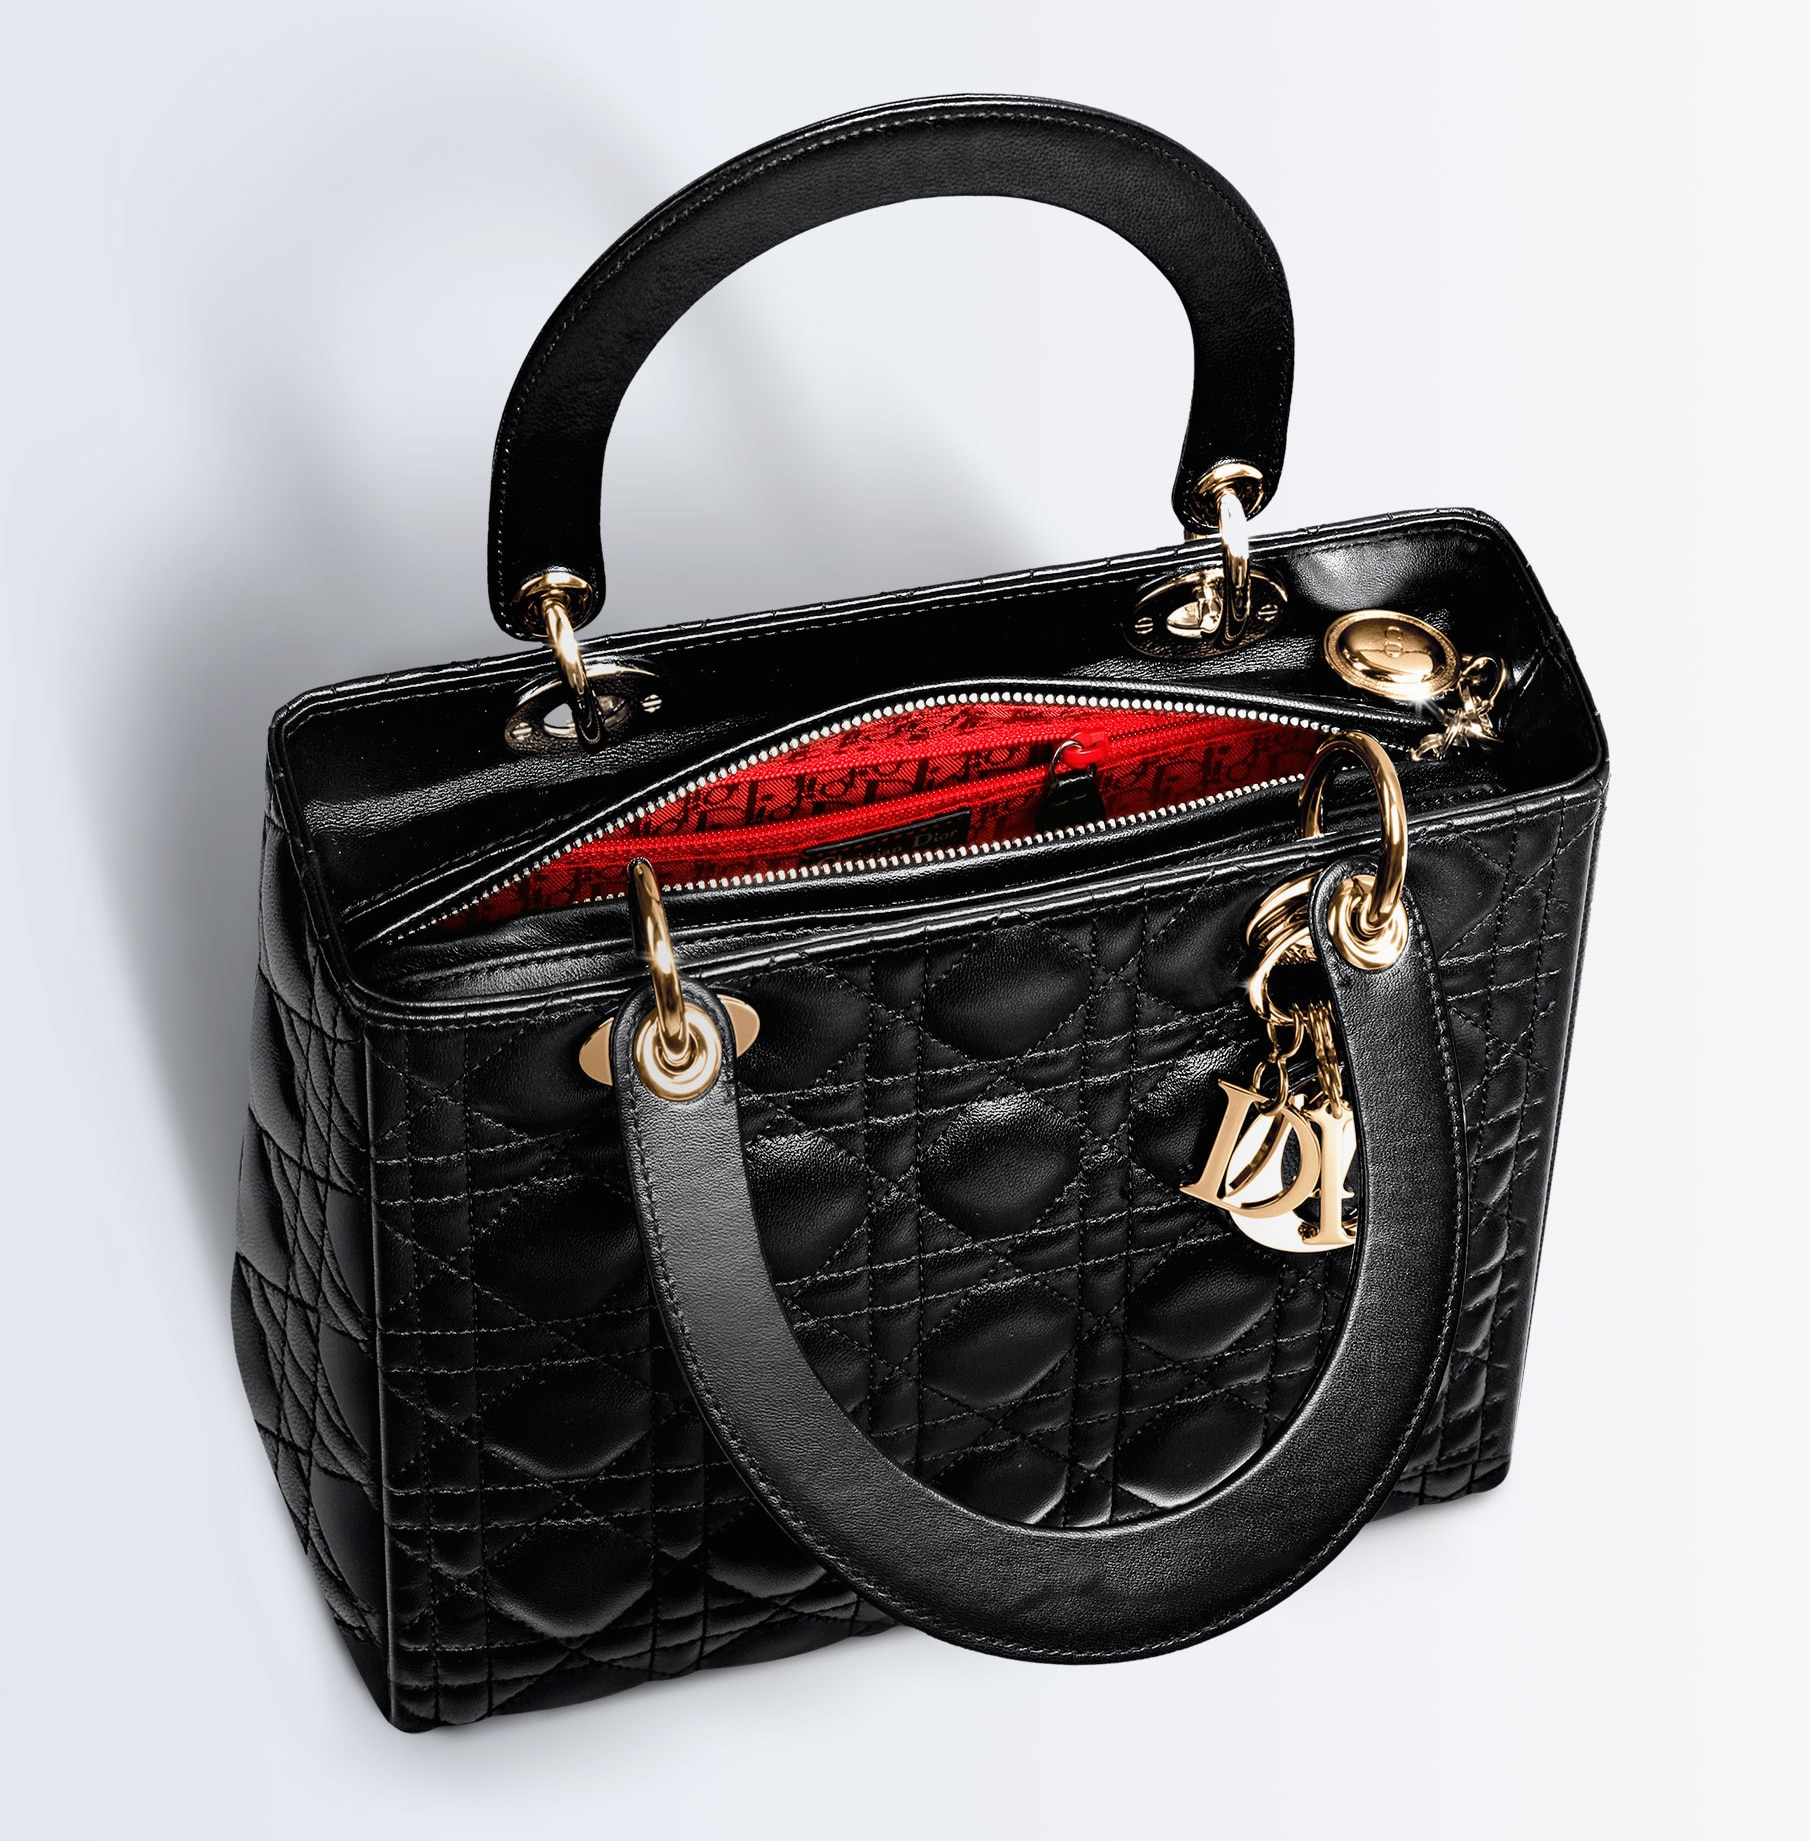 lady dior bag price - photo #16